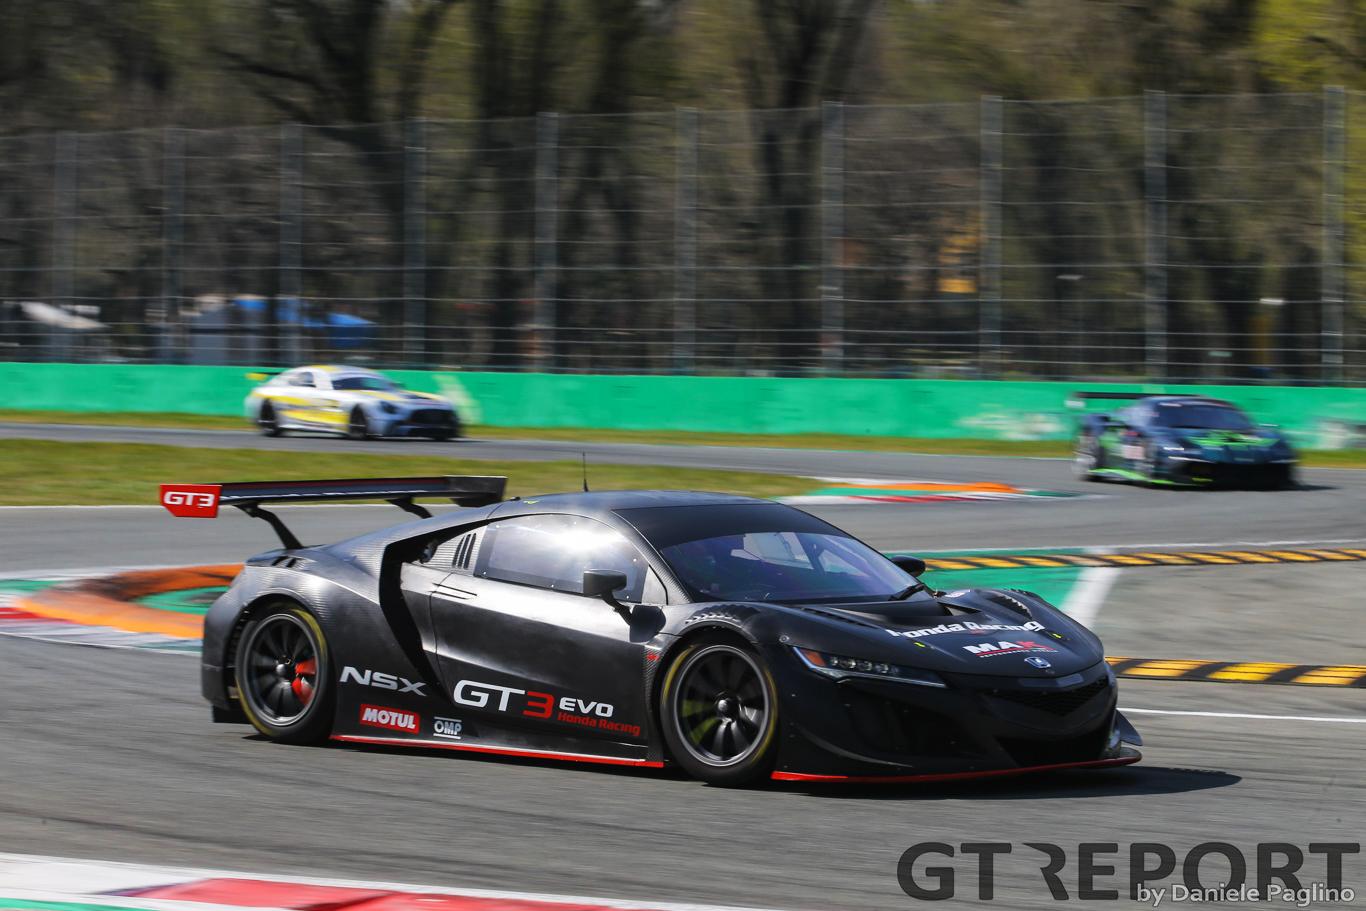 JAS development driver Erwin Zanotti sole driver of Honda NSX GT3 in Italian GT season-opener